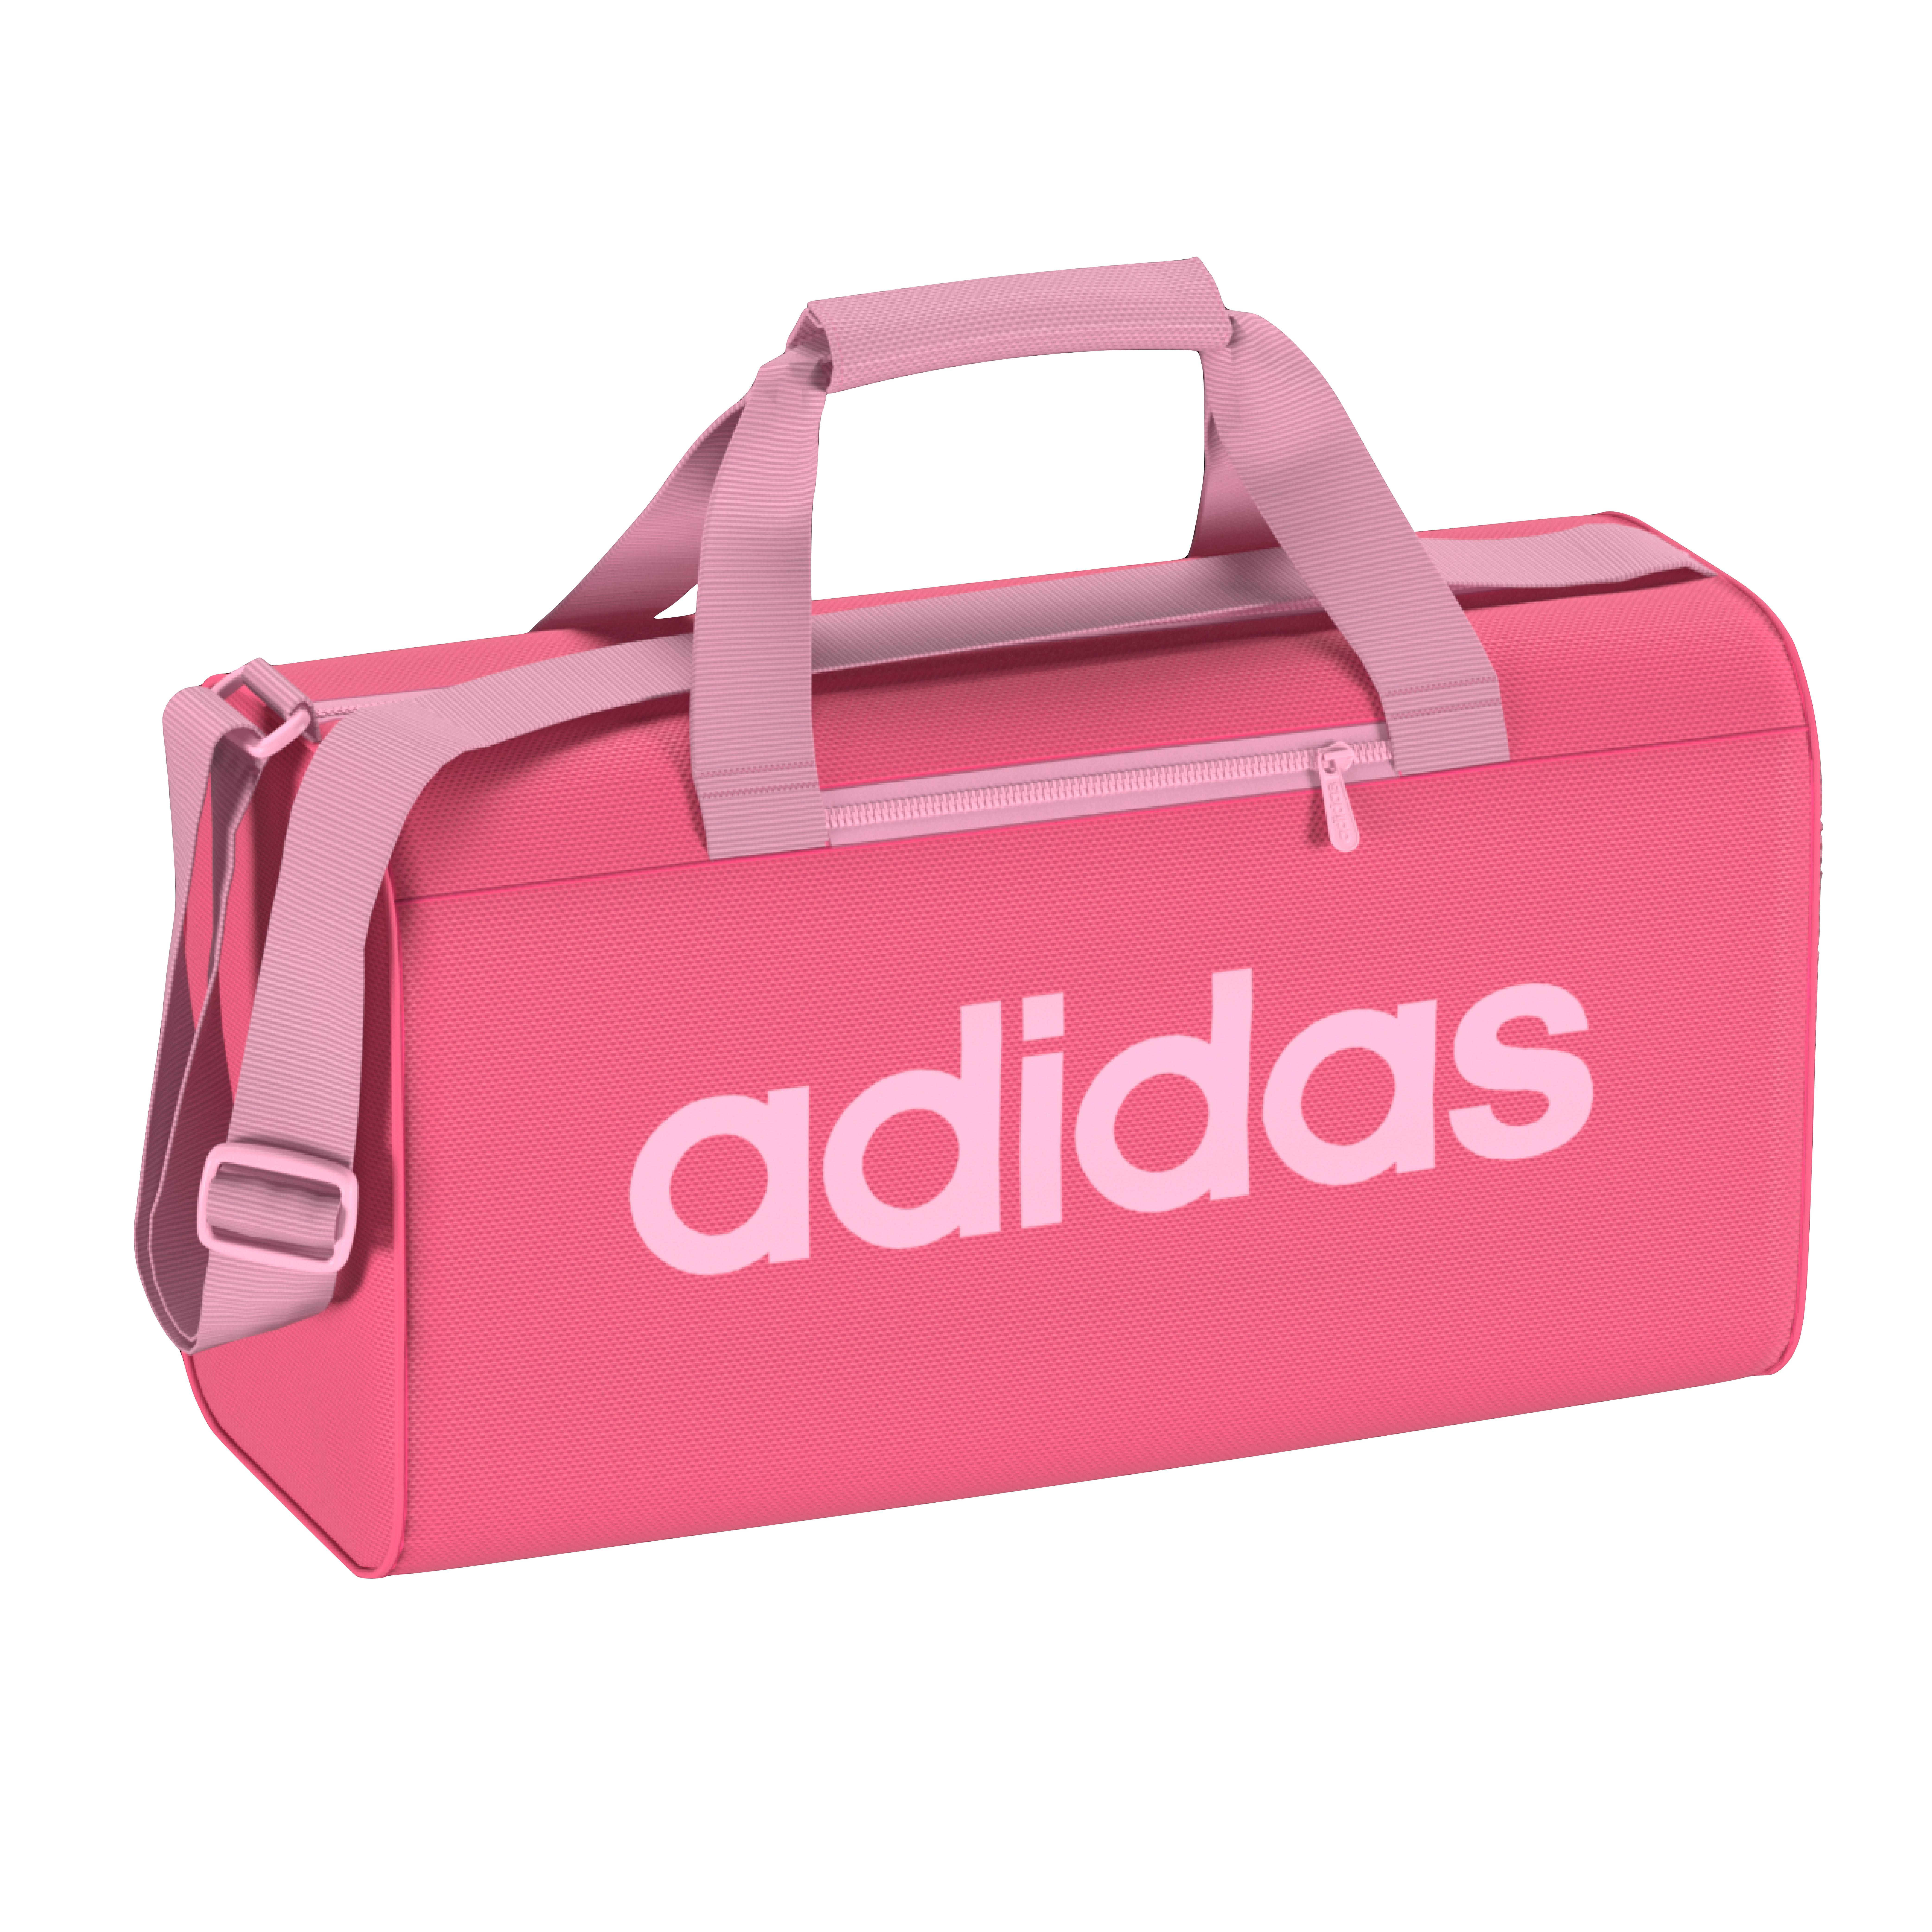 ca655525a6c Adidas kopen? | Decathlon.nl